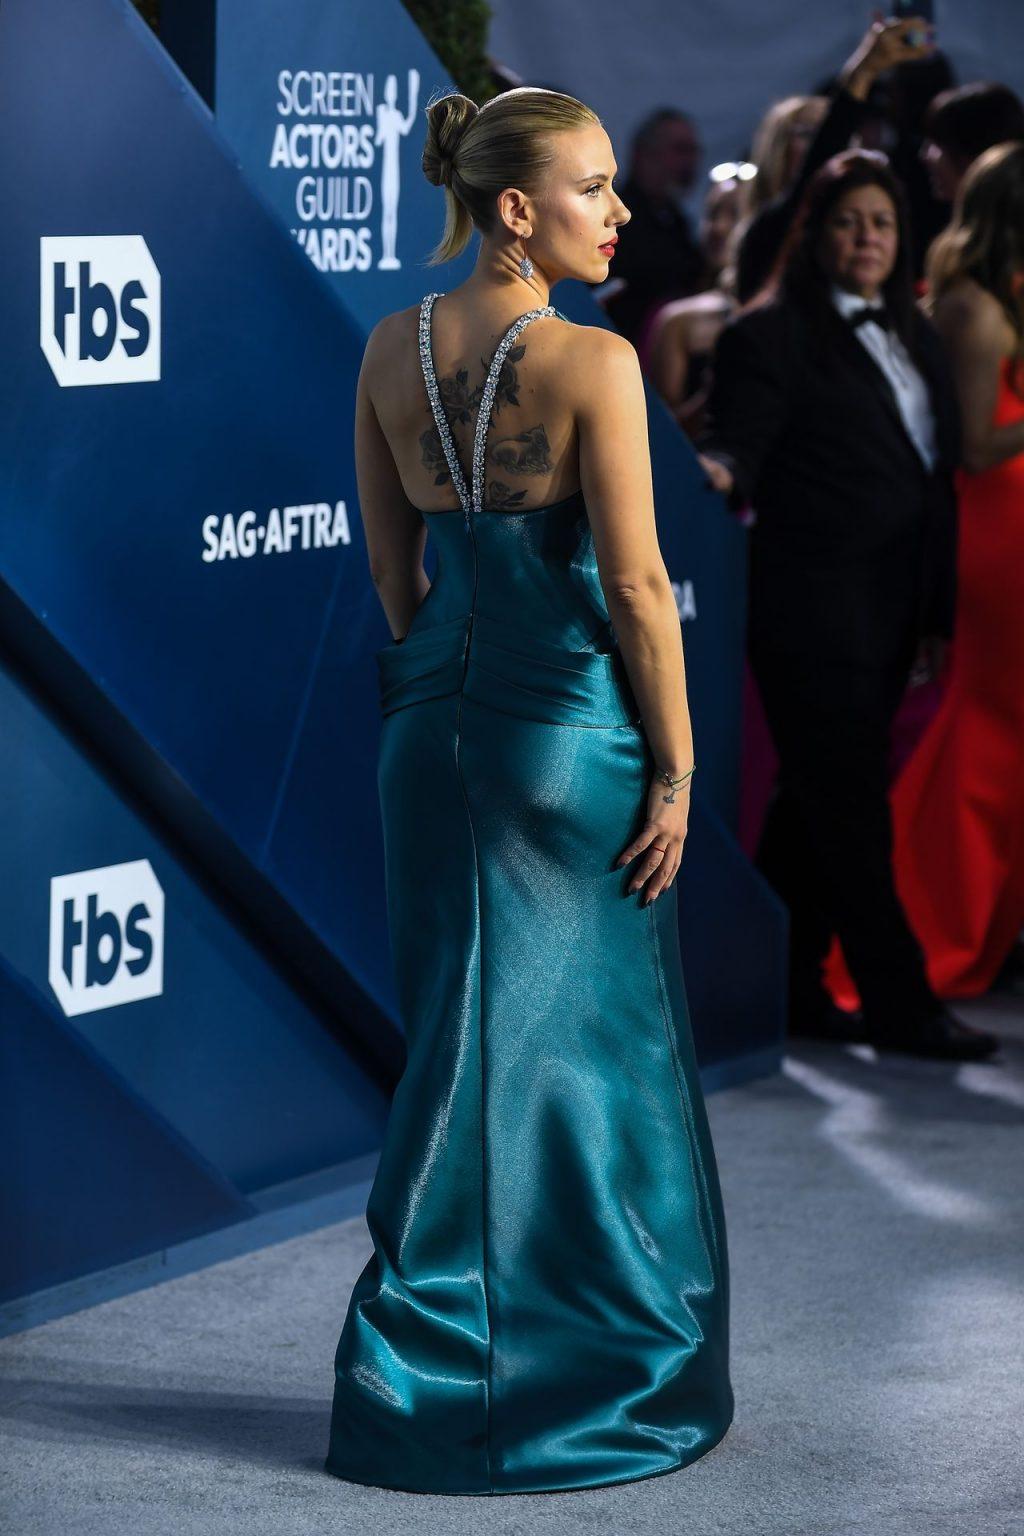 Scarlett Johansson Looks Stunning at the SAG Awards (130 Photos)